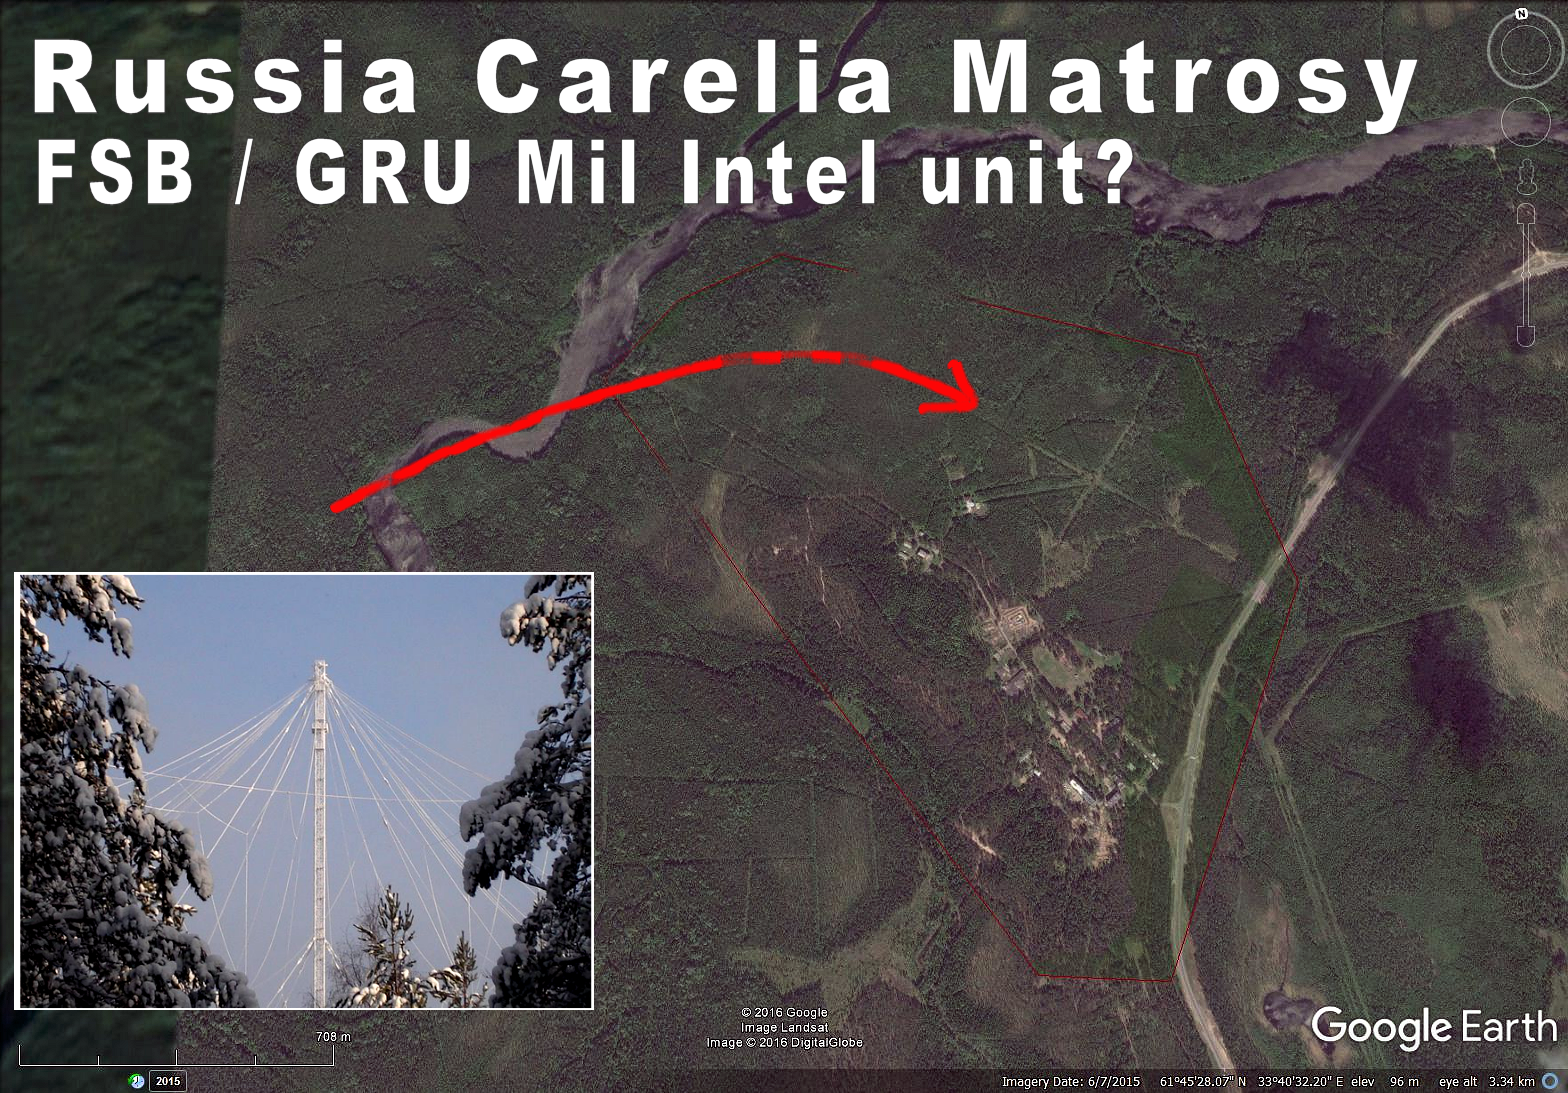 Massive new radars at Baltic Sea coast